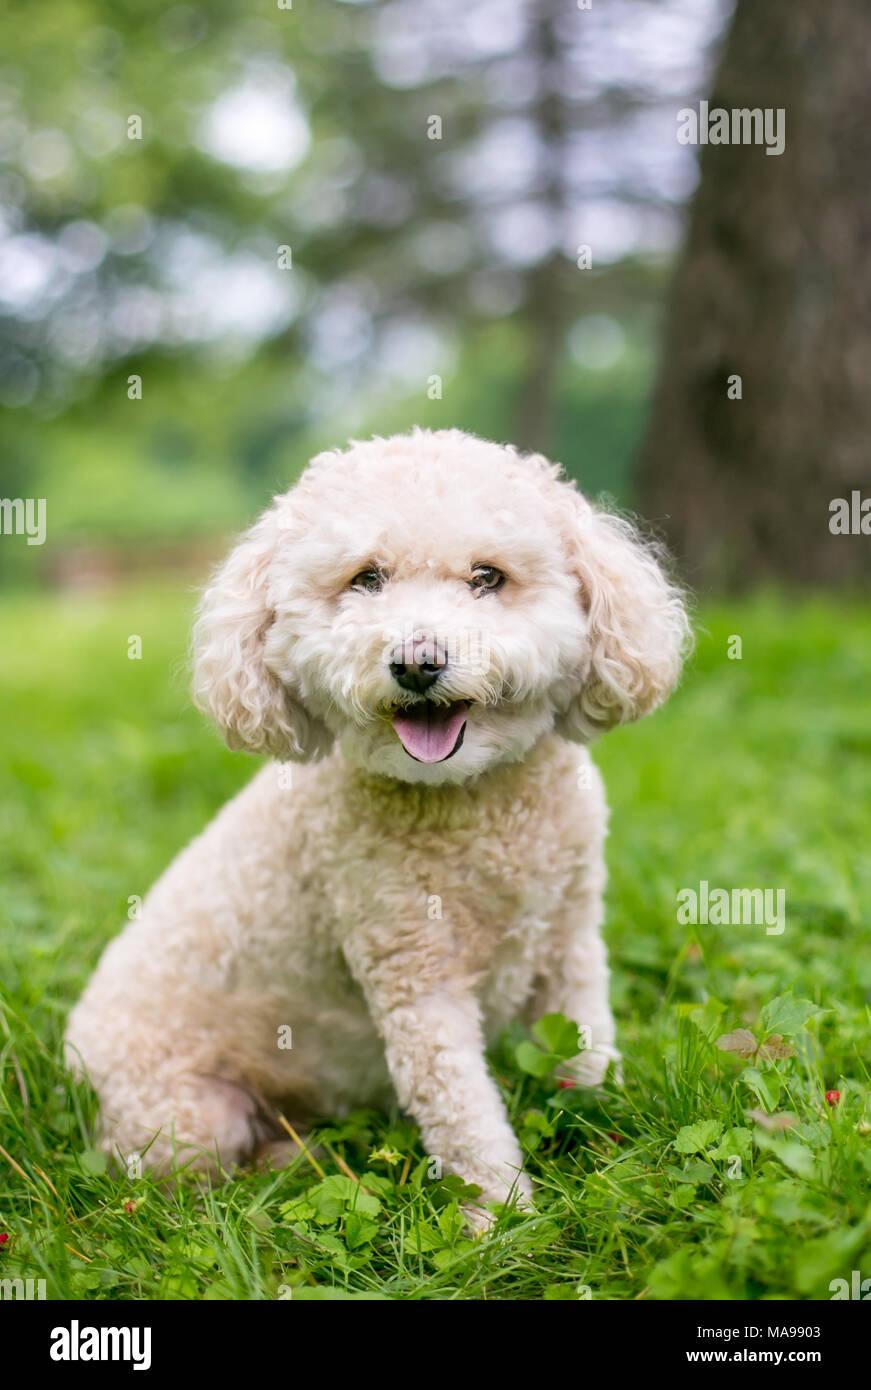 A cute Miniature Poodle dog outdoors - Stock Image